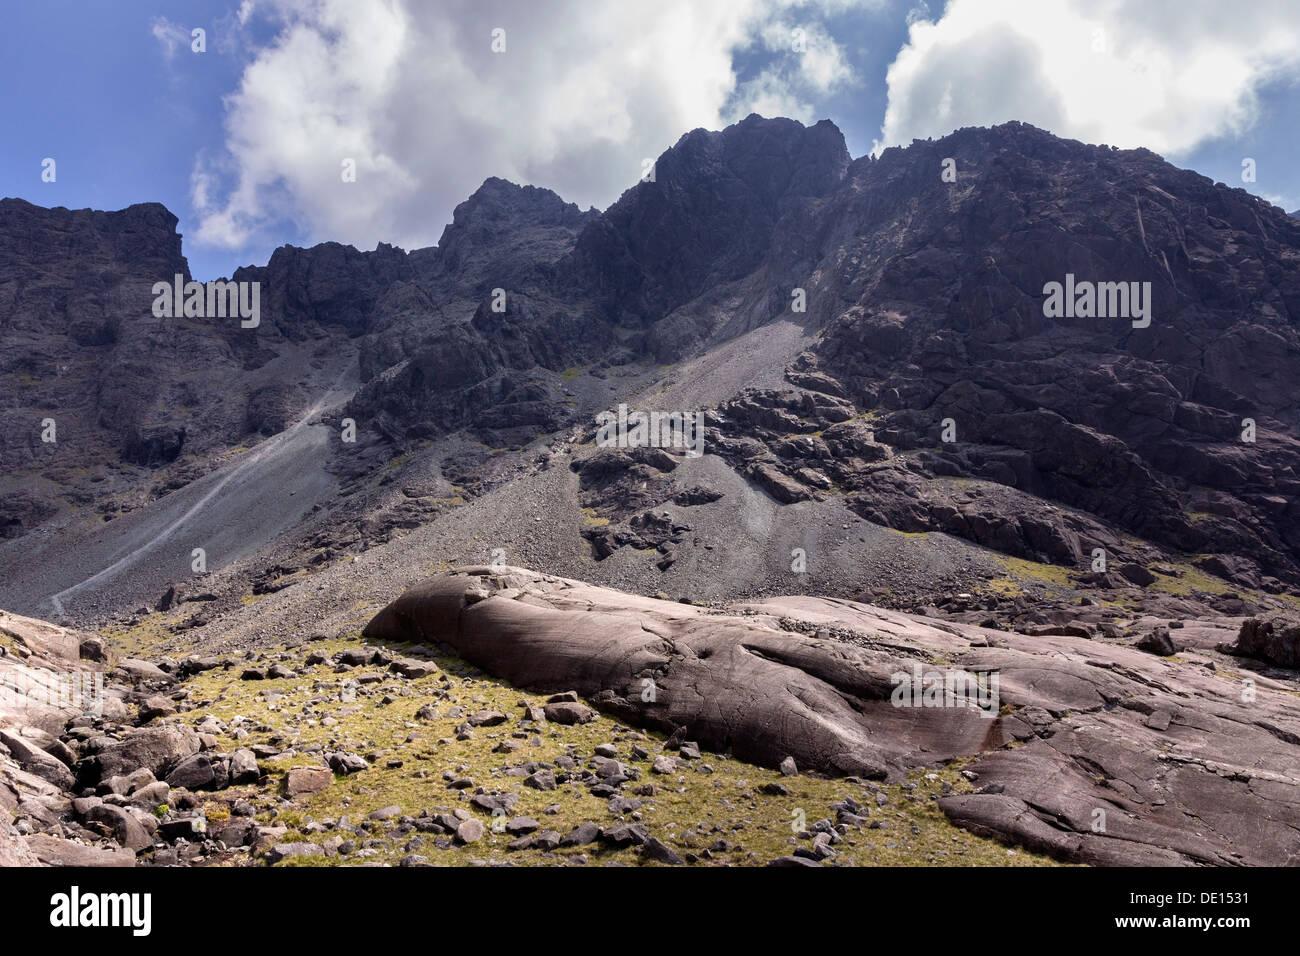 Black Cuillin mountain ridge, Coire Lagan, Glenbrittle, Isle of Skye, Scotland, UK - Stock Image